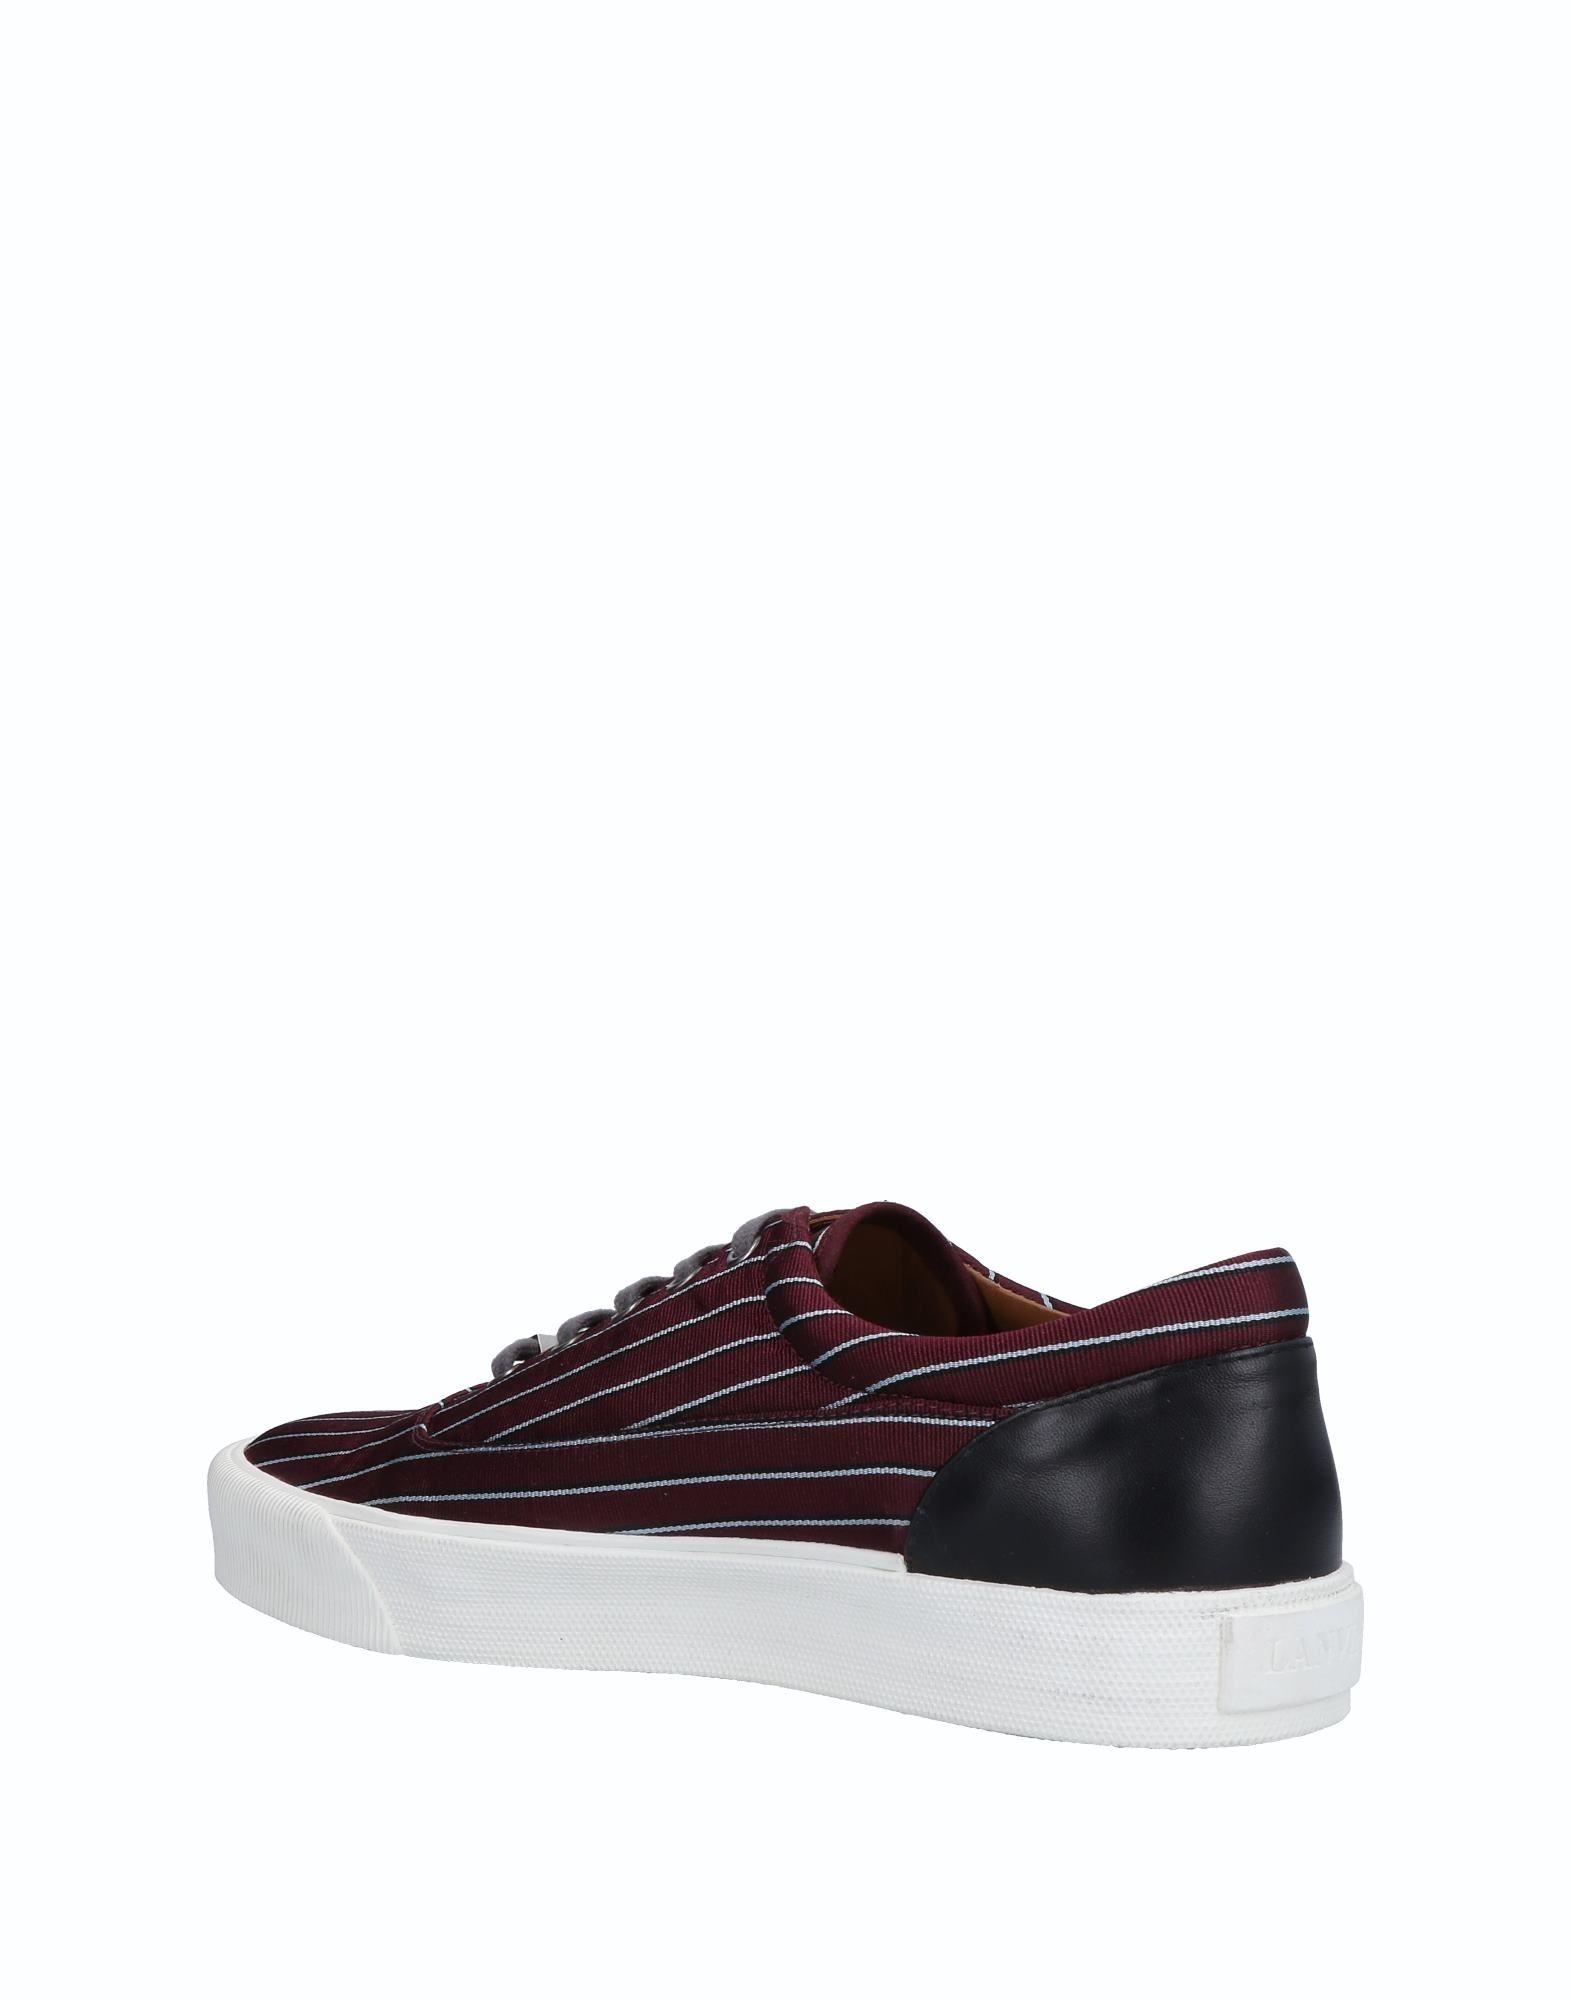 Lanvin Sneakers Herren  11514110HS Gute Qualität beliebte Schuhe